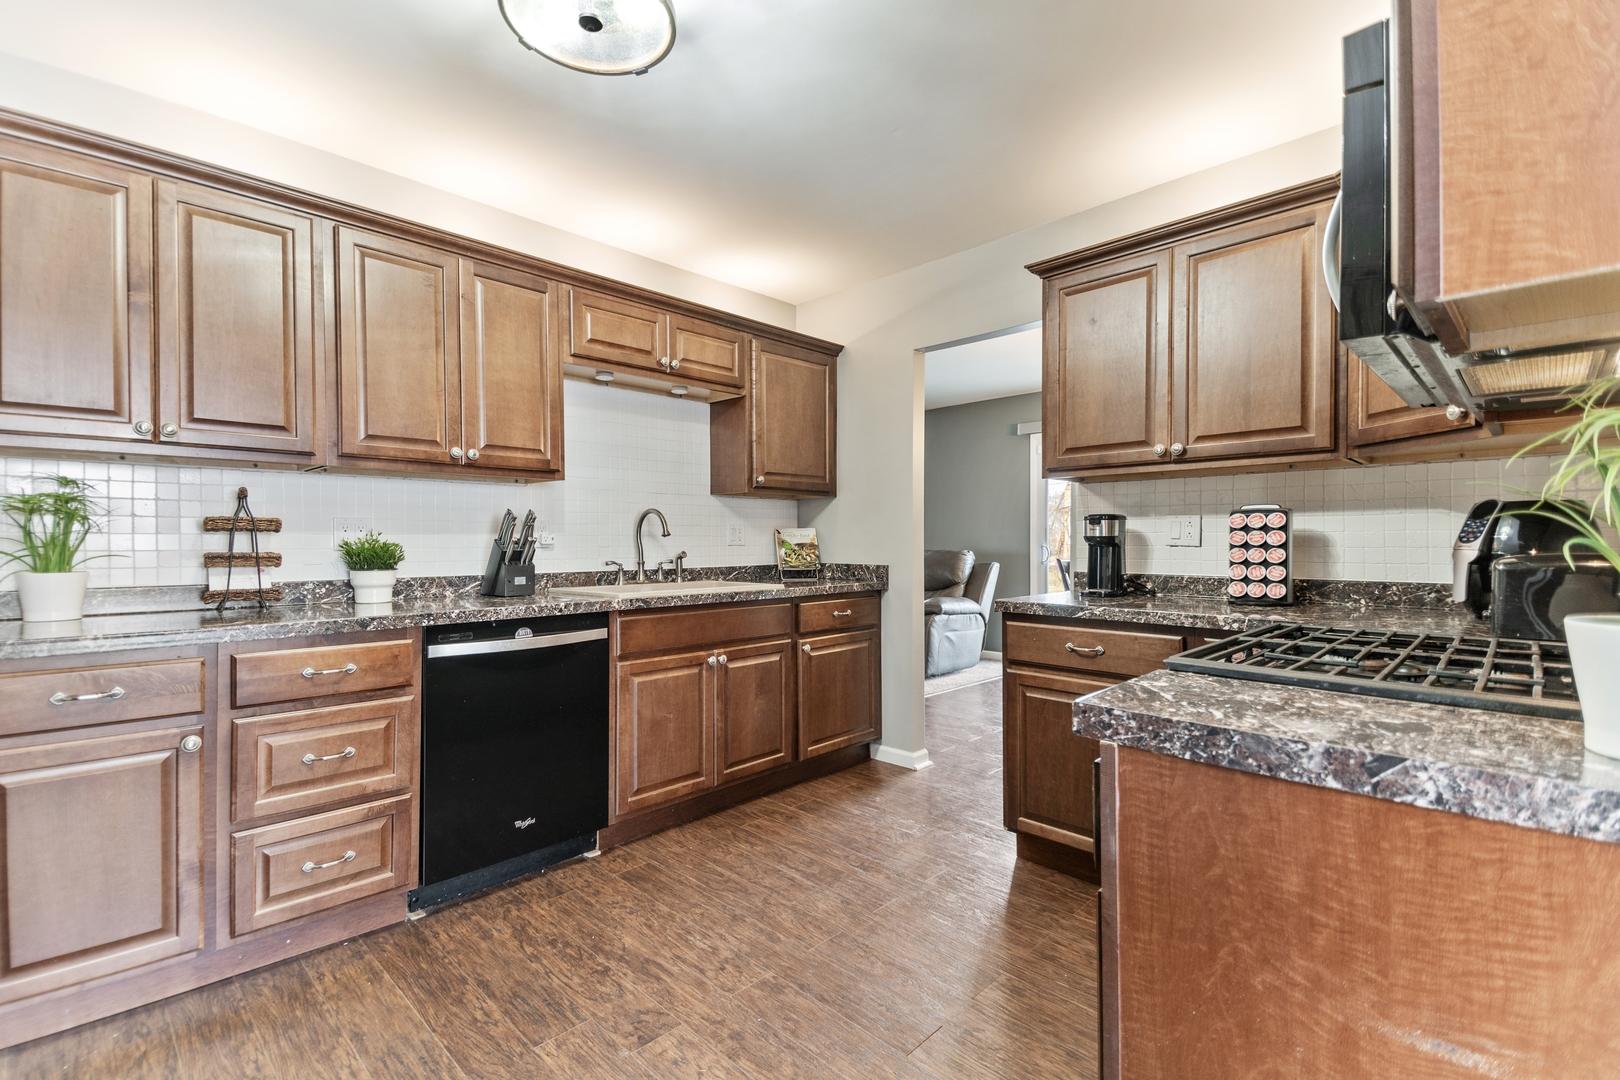 1660 Kent, Hoffman Estates, Illinois, 60194